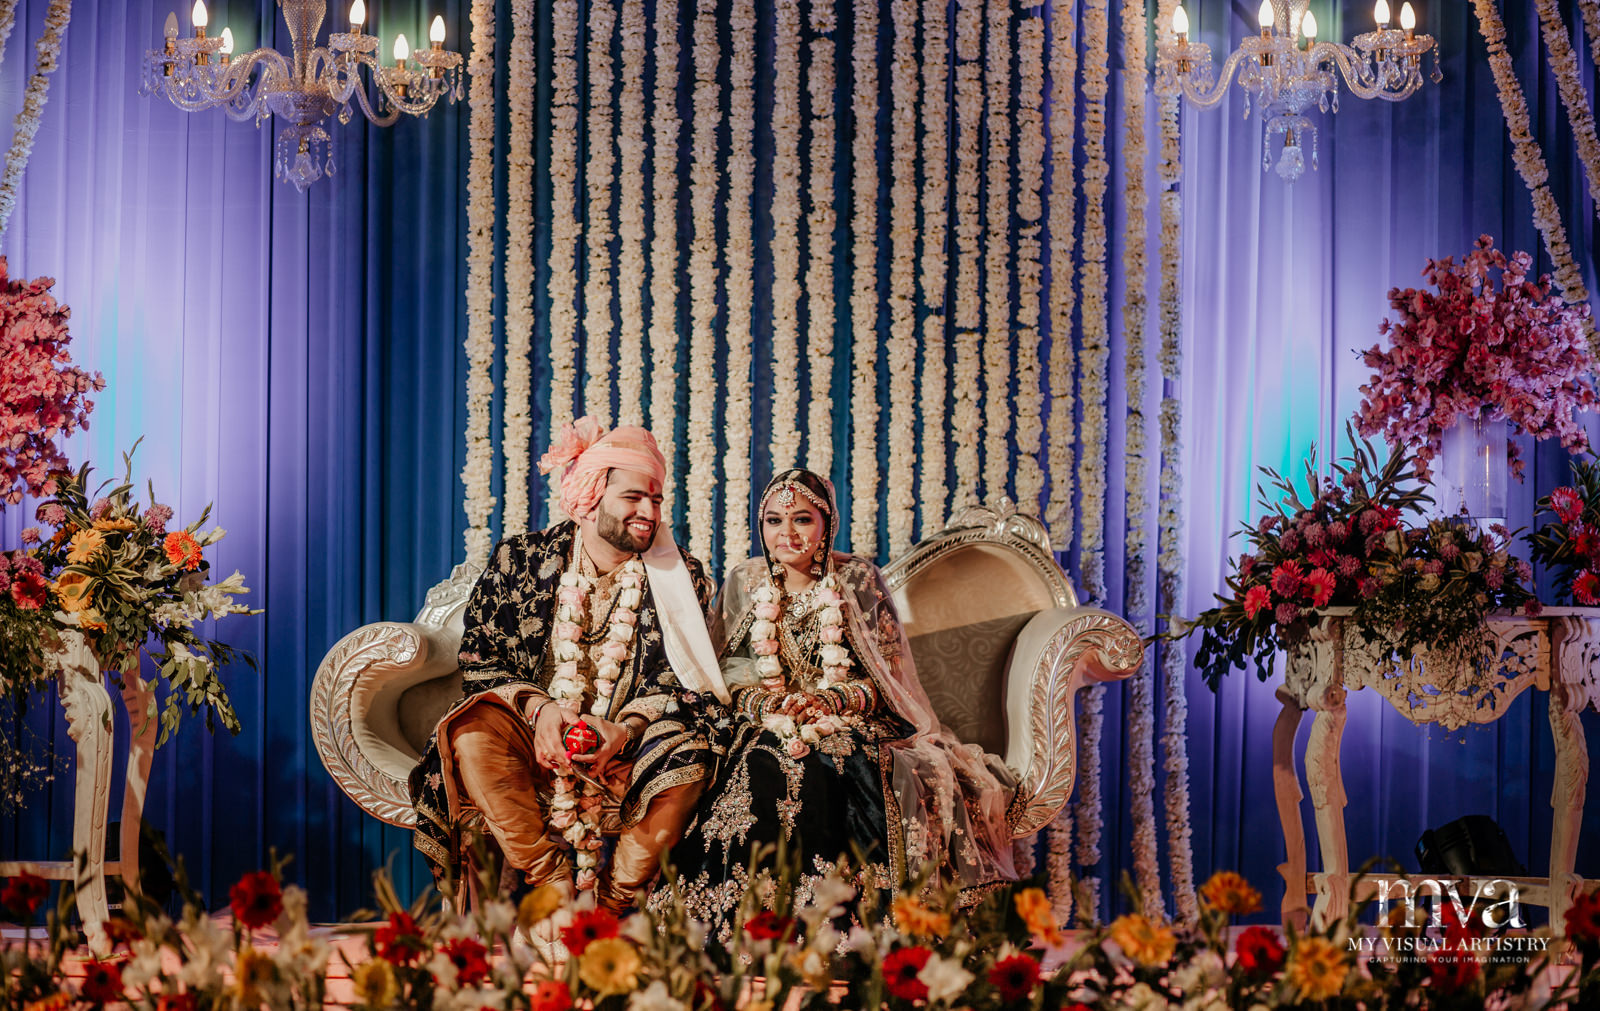 1073 -Vani_Sarang_ Photographer_My Visual Artistry_Wedding_MVA_Destination-9592.jpg